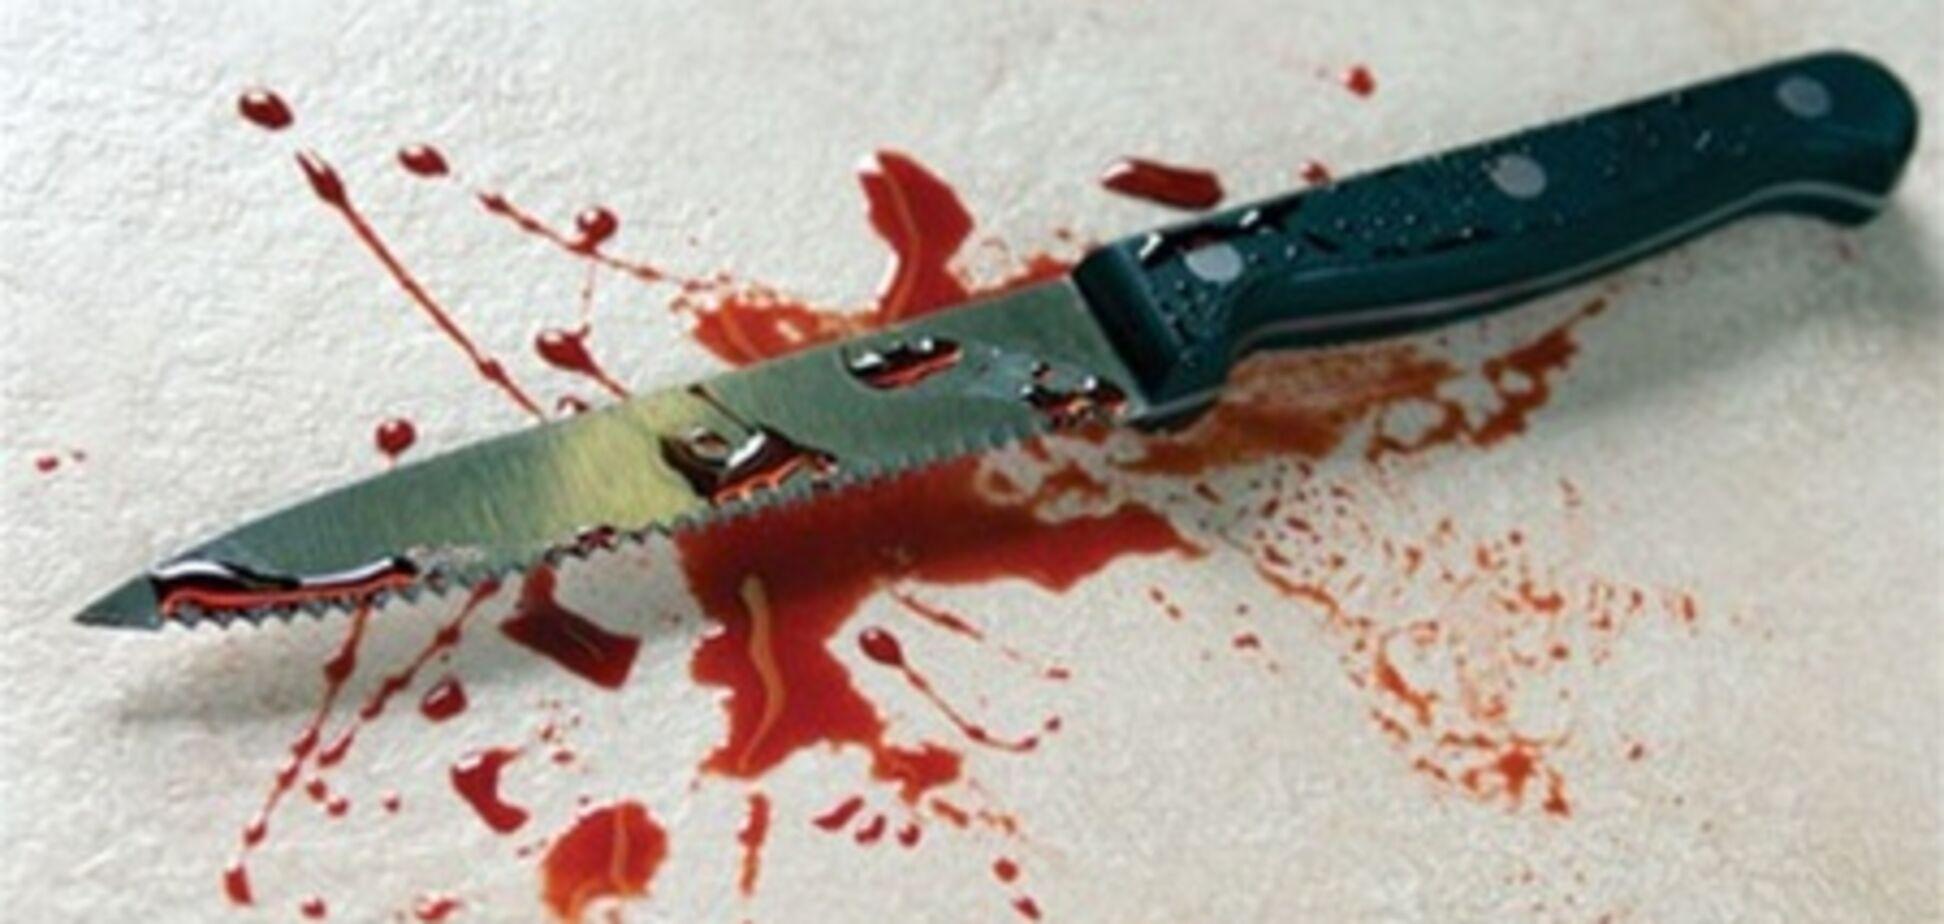 Драма на ножах